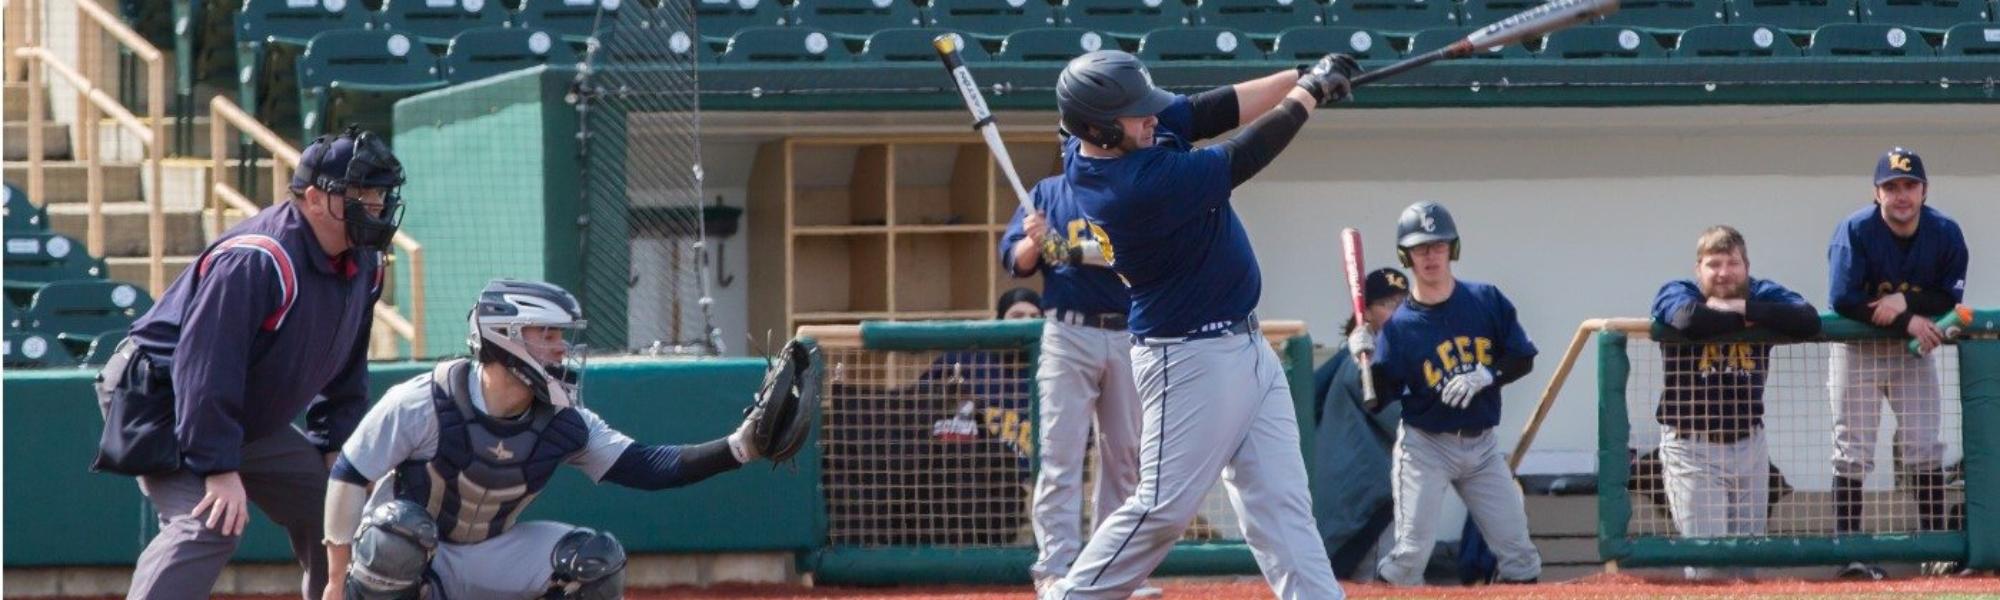 LCCC Baseball Team At Bat